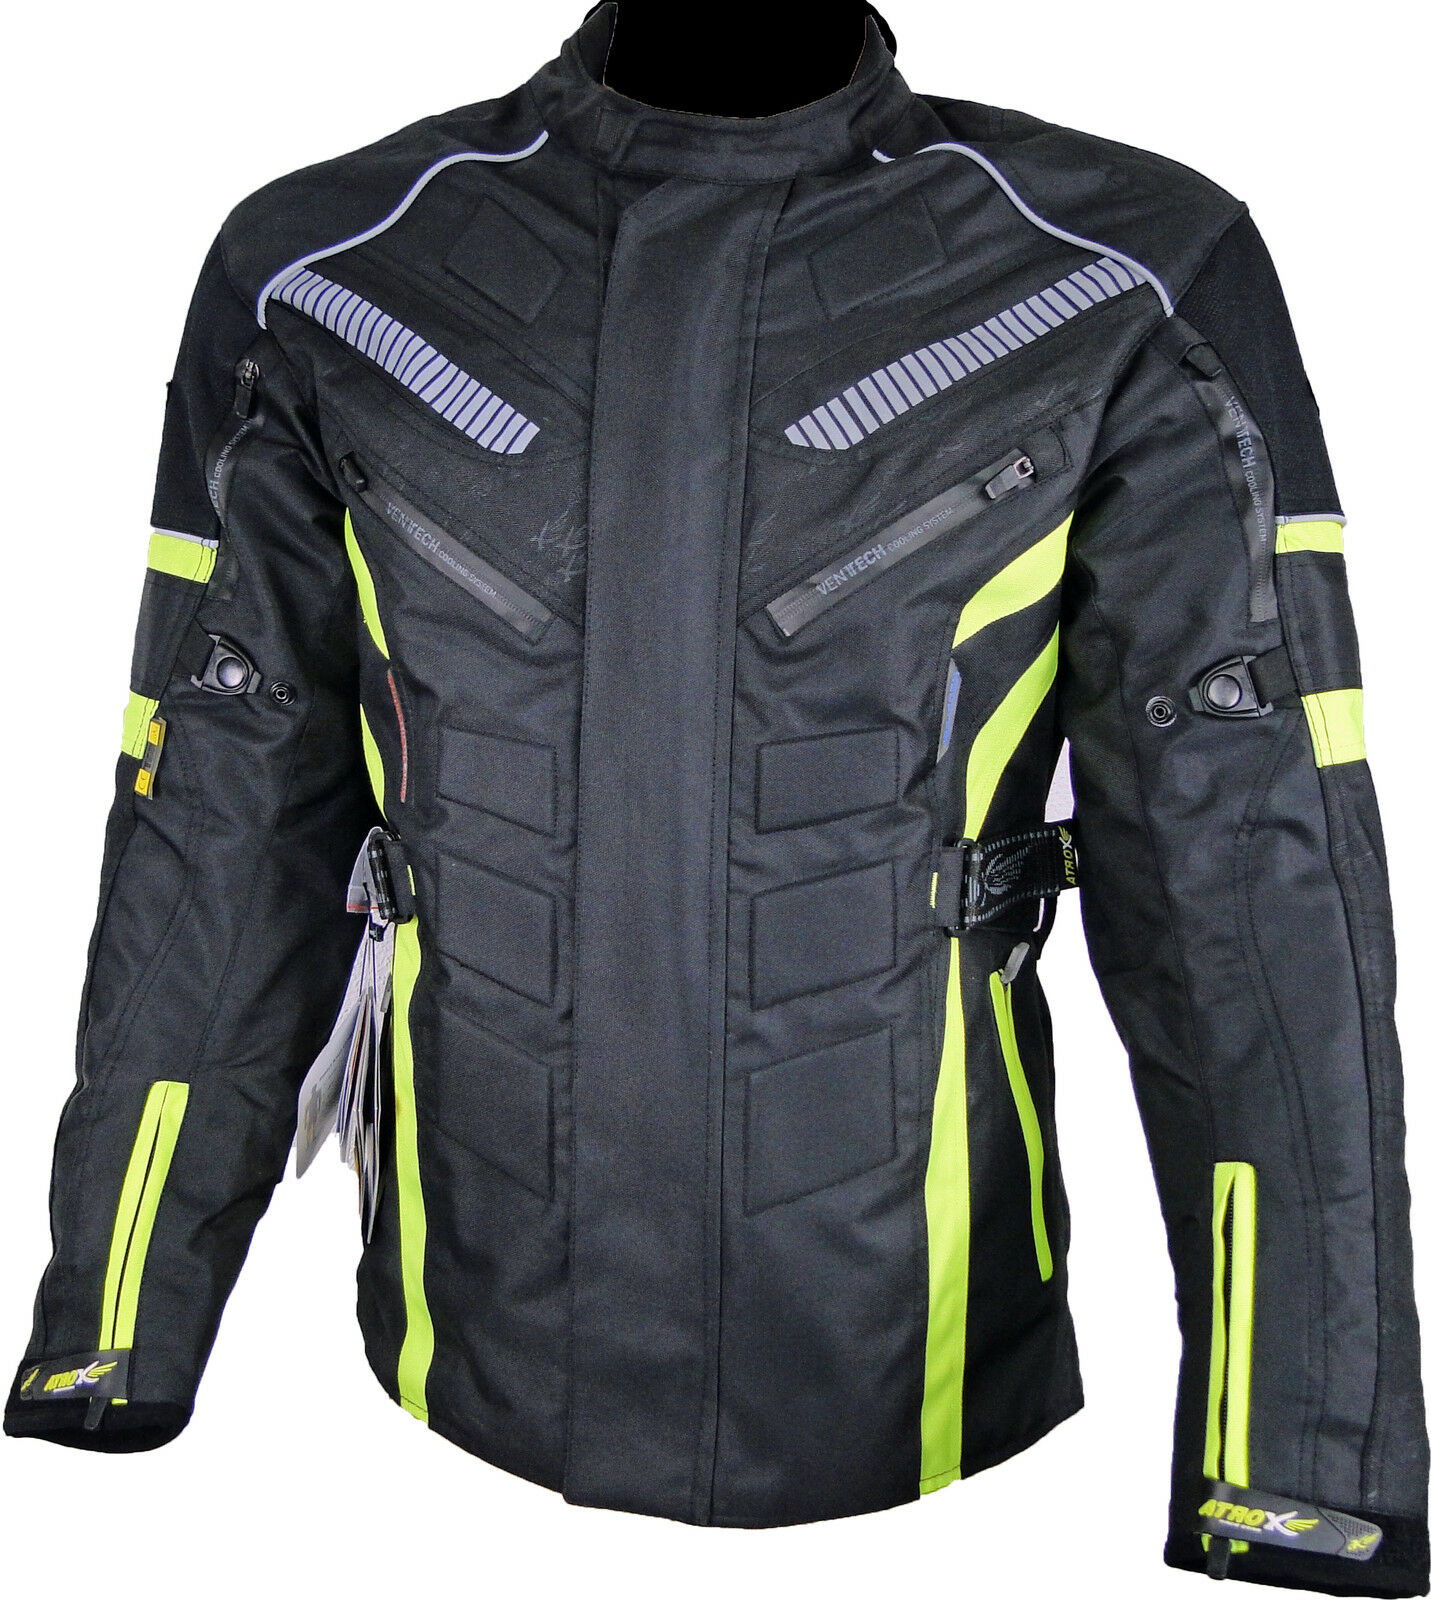 Chaqueta de moto, Cordura, Textil ropa Motocicleta ATROX nf2200 xl